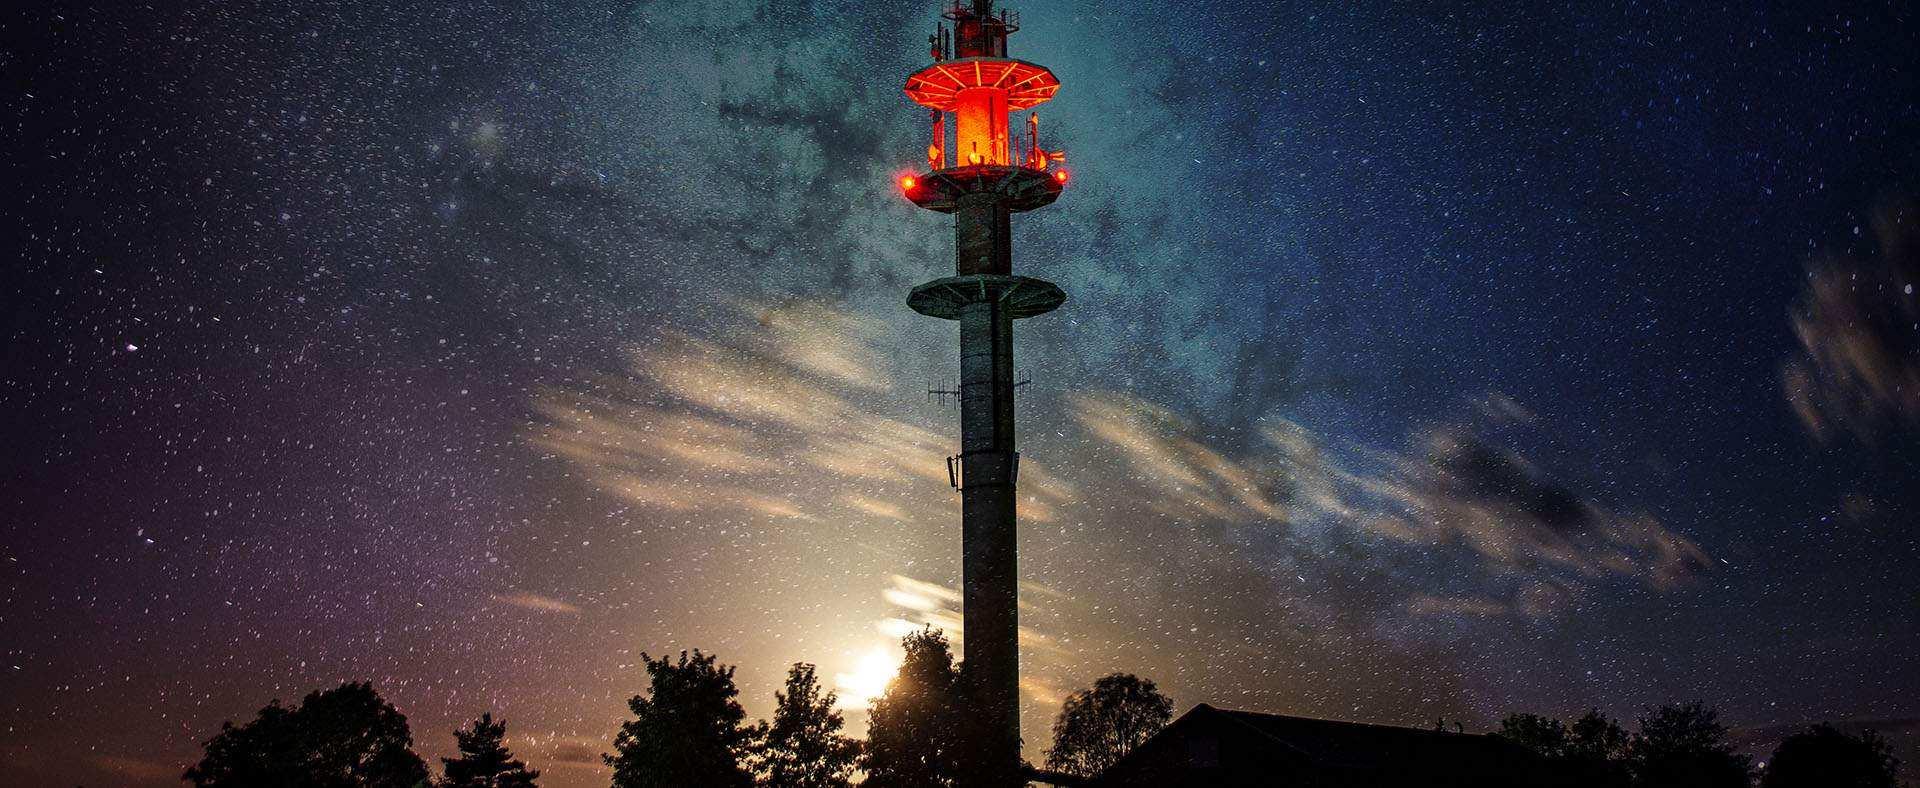 Nacht-Fotowalk, LZB zum Cospoth im Juli, 2020